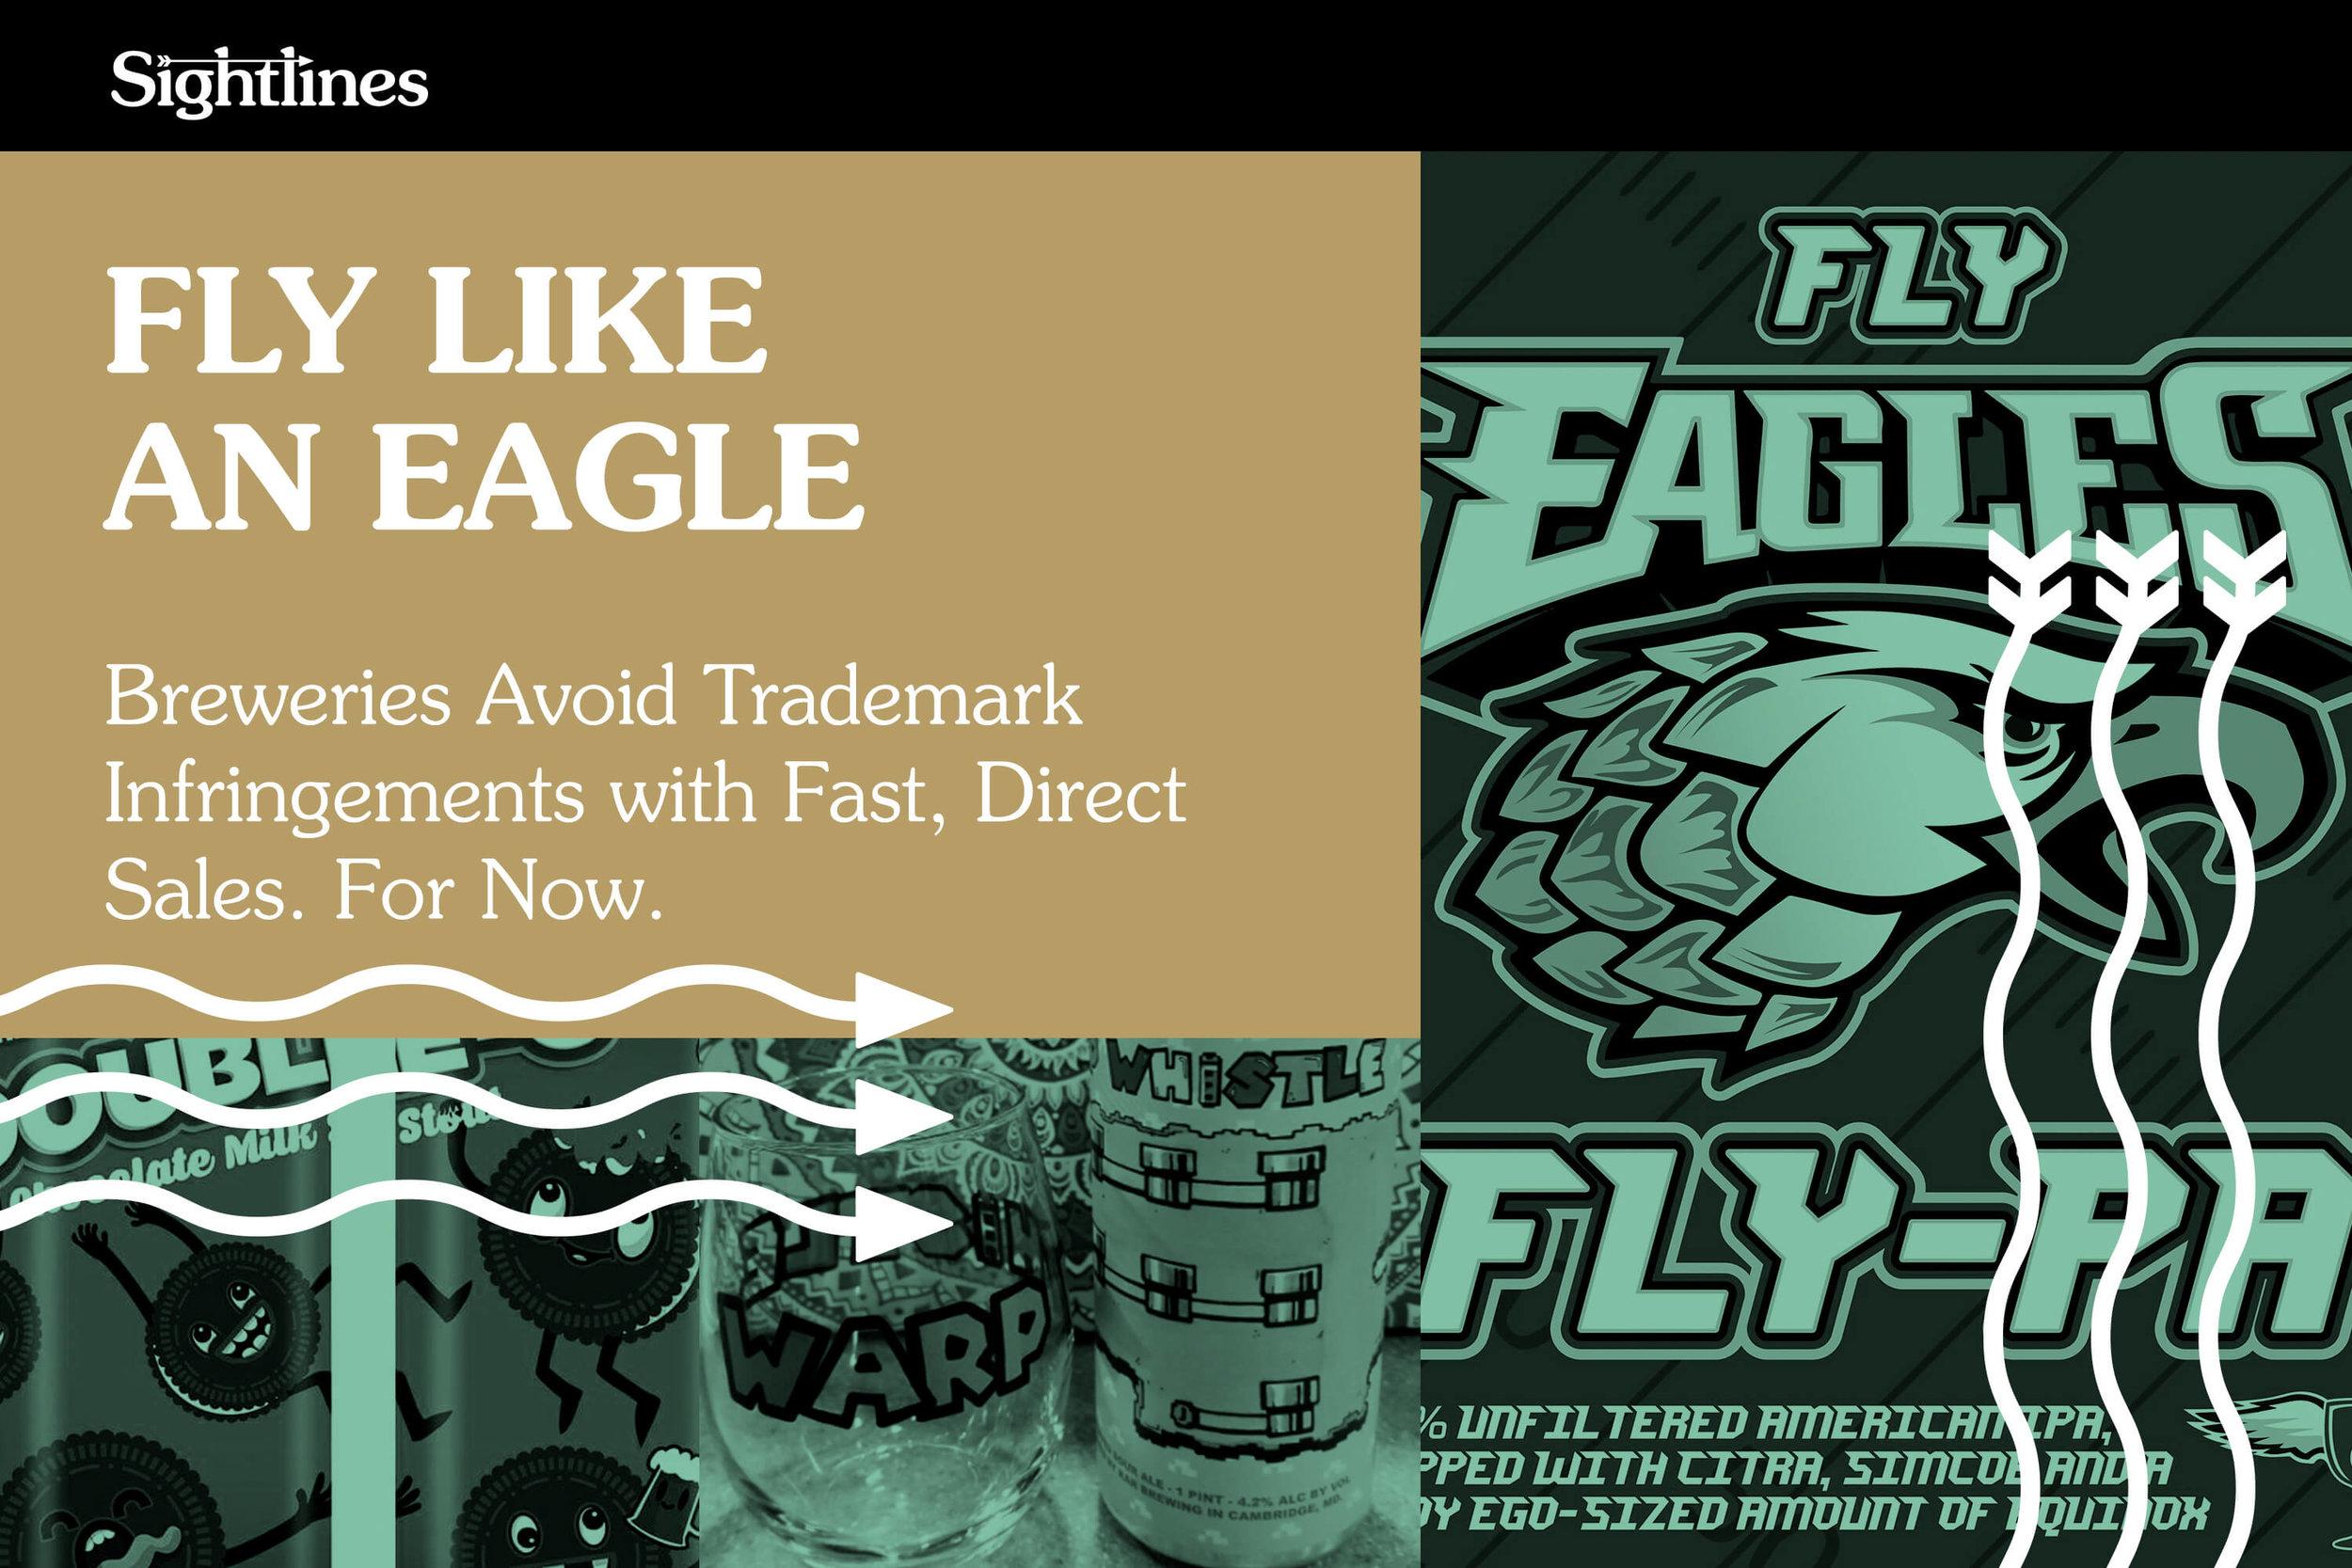 FlyLikeAnEagle.jpg